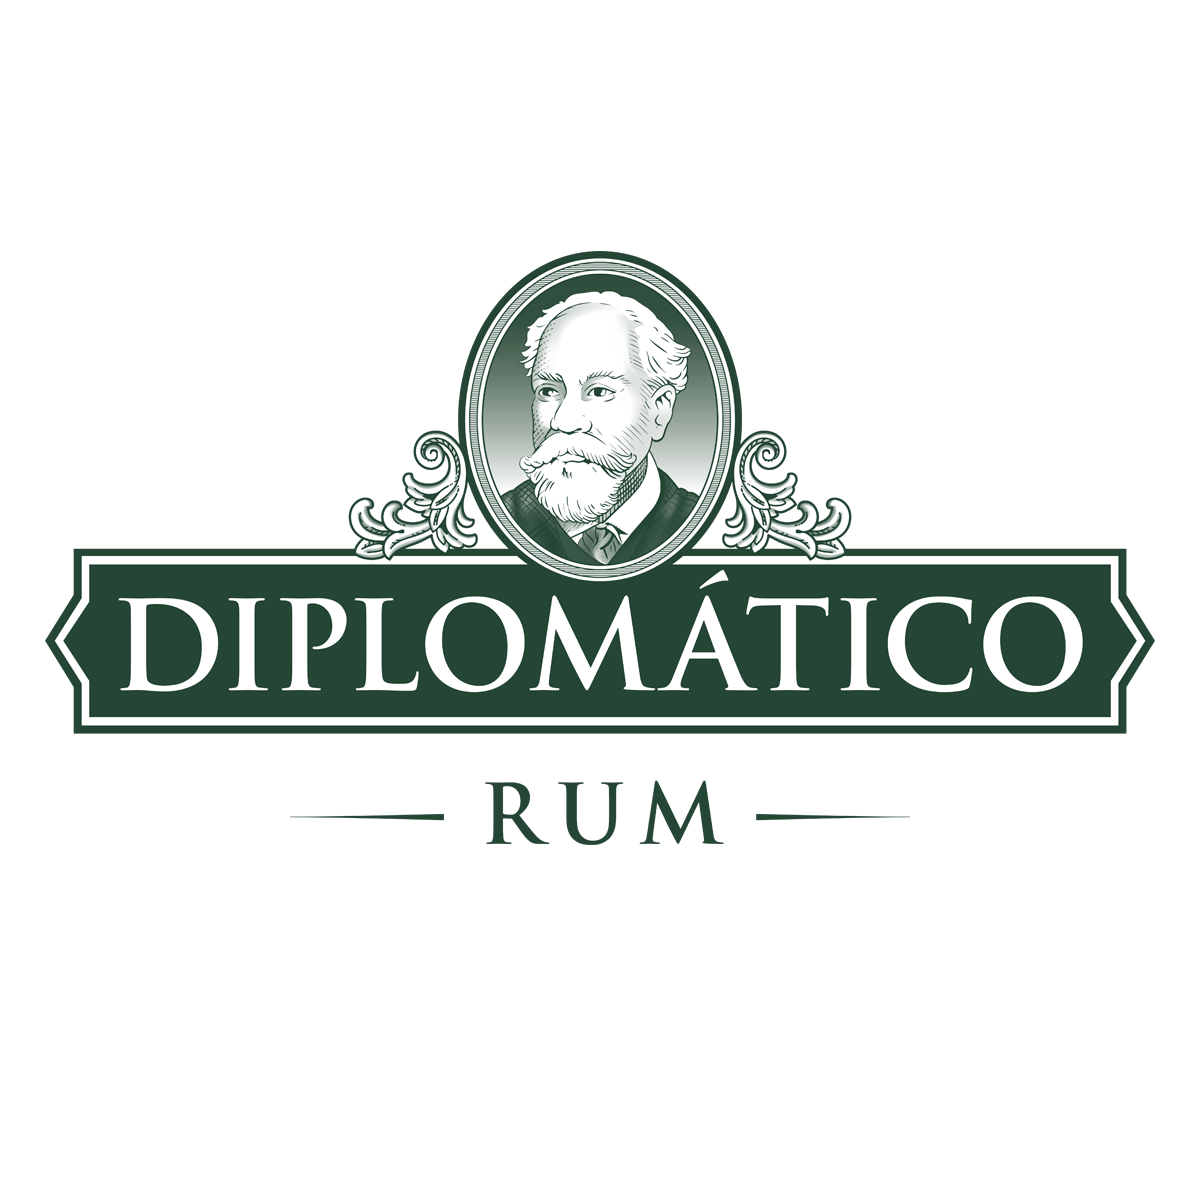 Diplomatico_rhum_ron